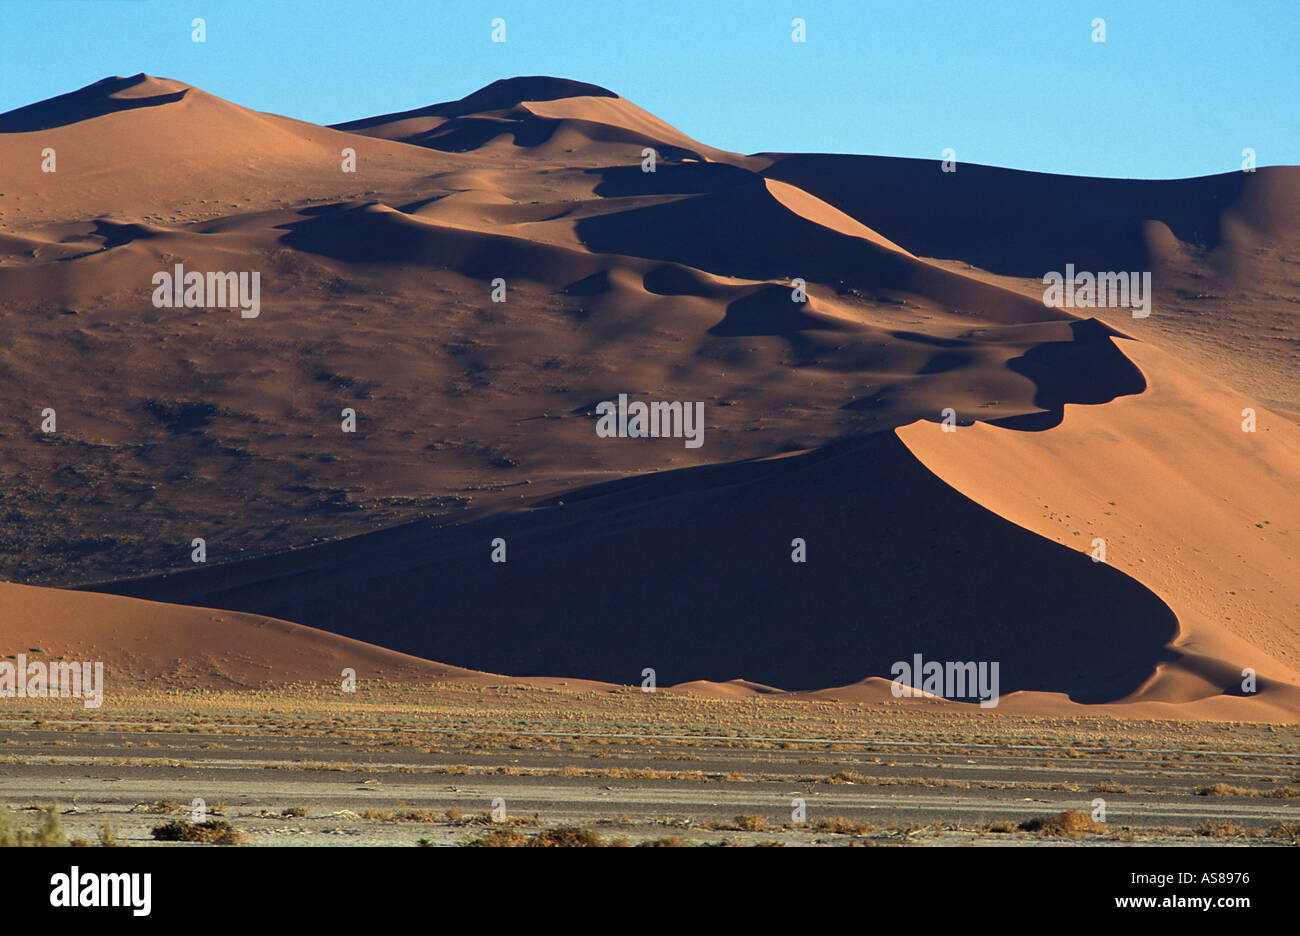 Sand dunes and surrounding desert at sunrise Namib Naukluft National Park en route to Dune 45 and Sossusvlei - Stock Image